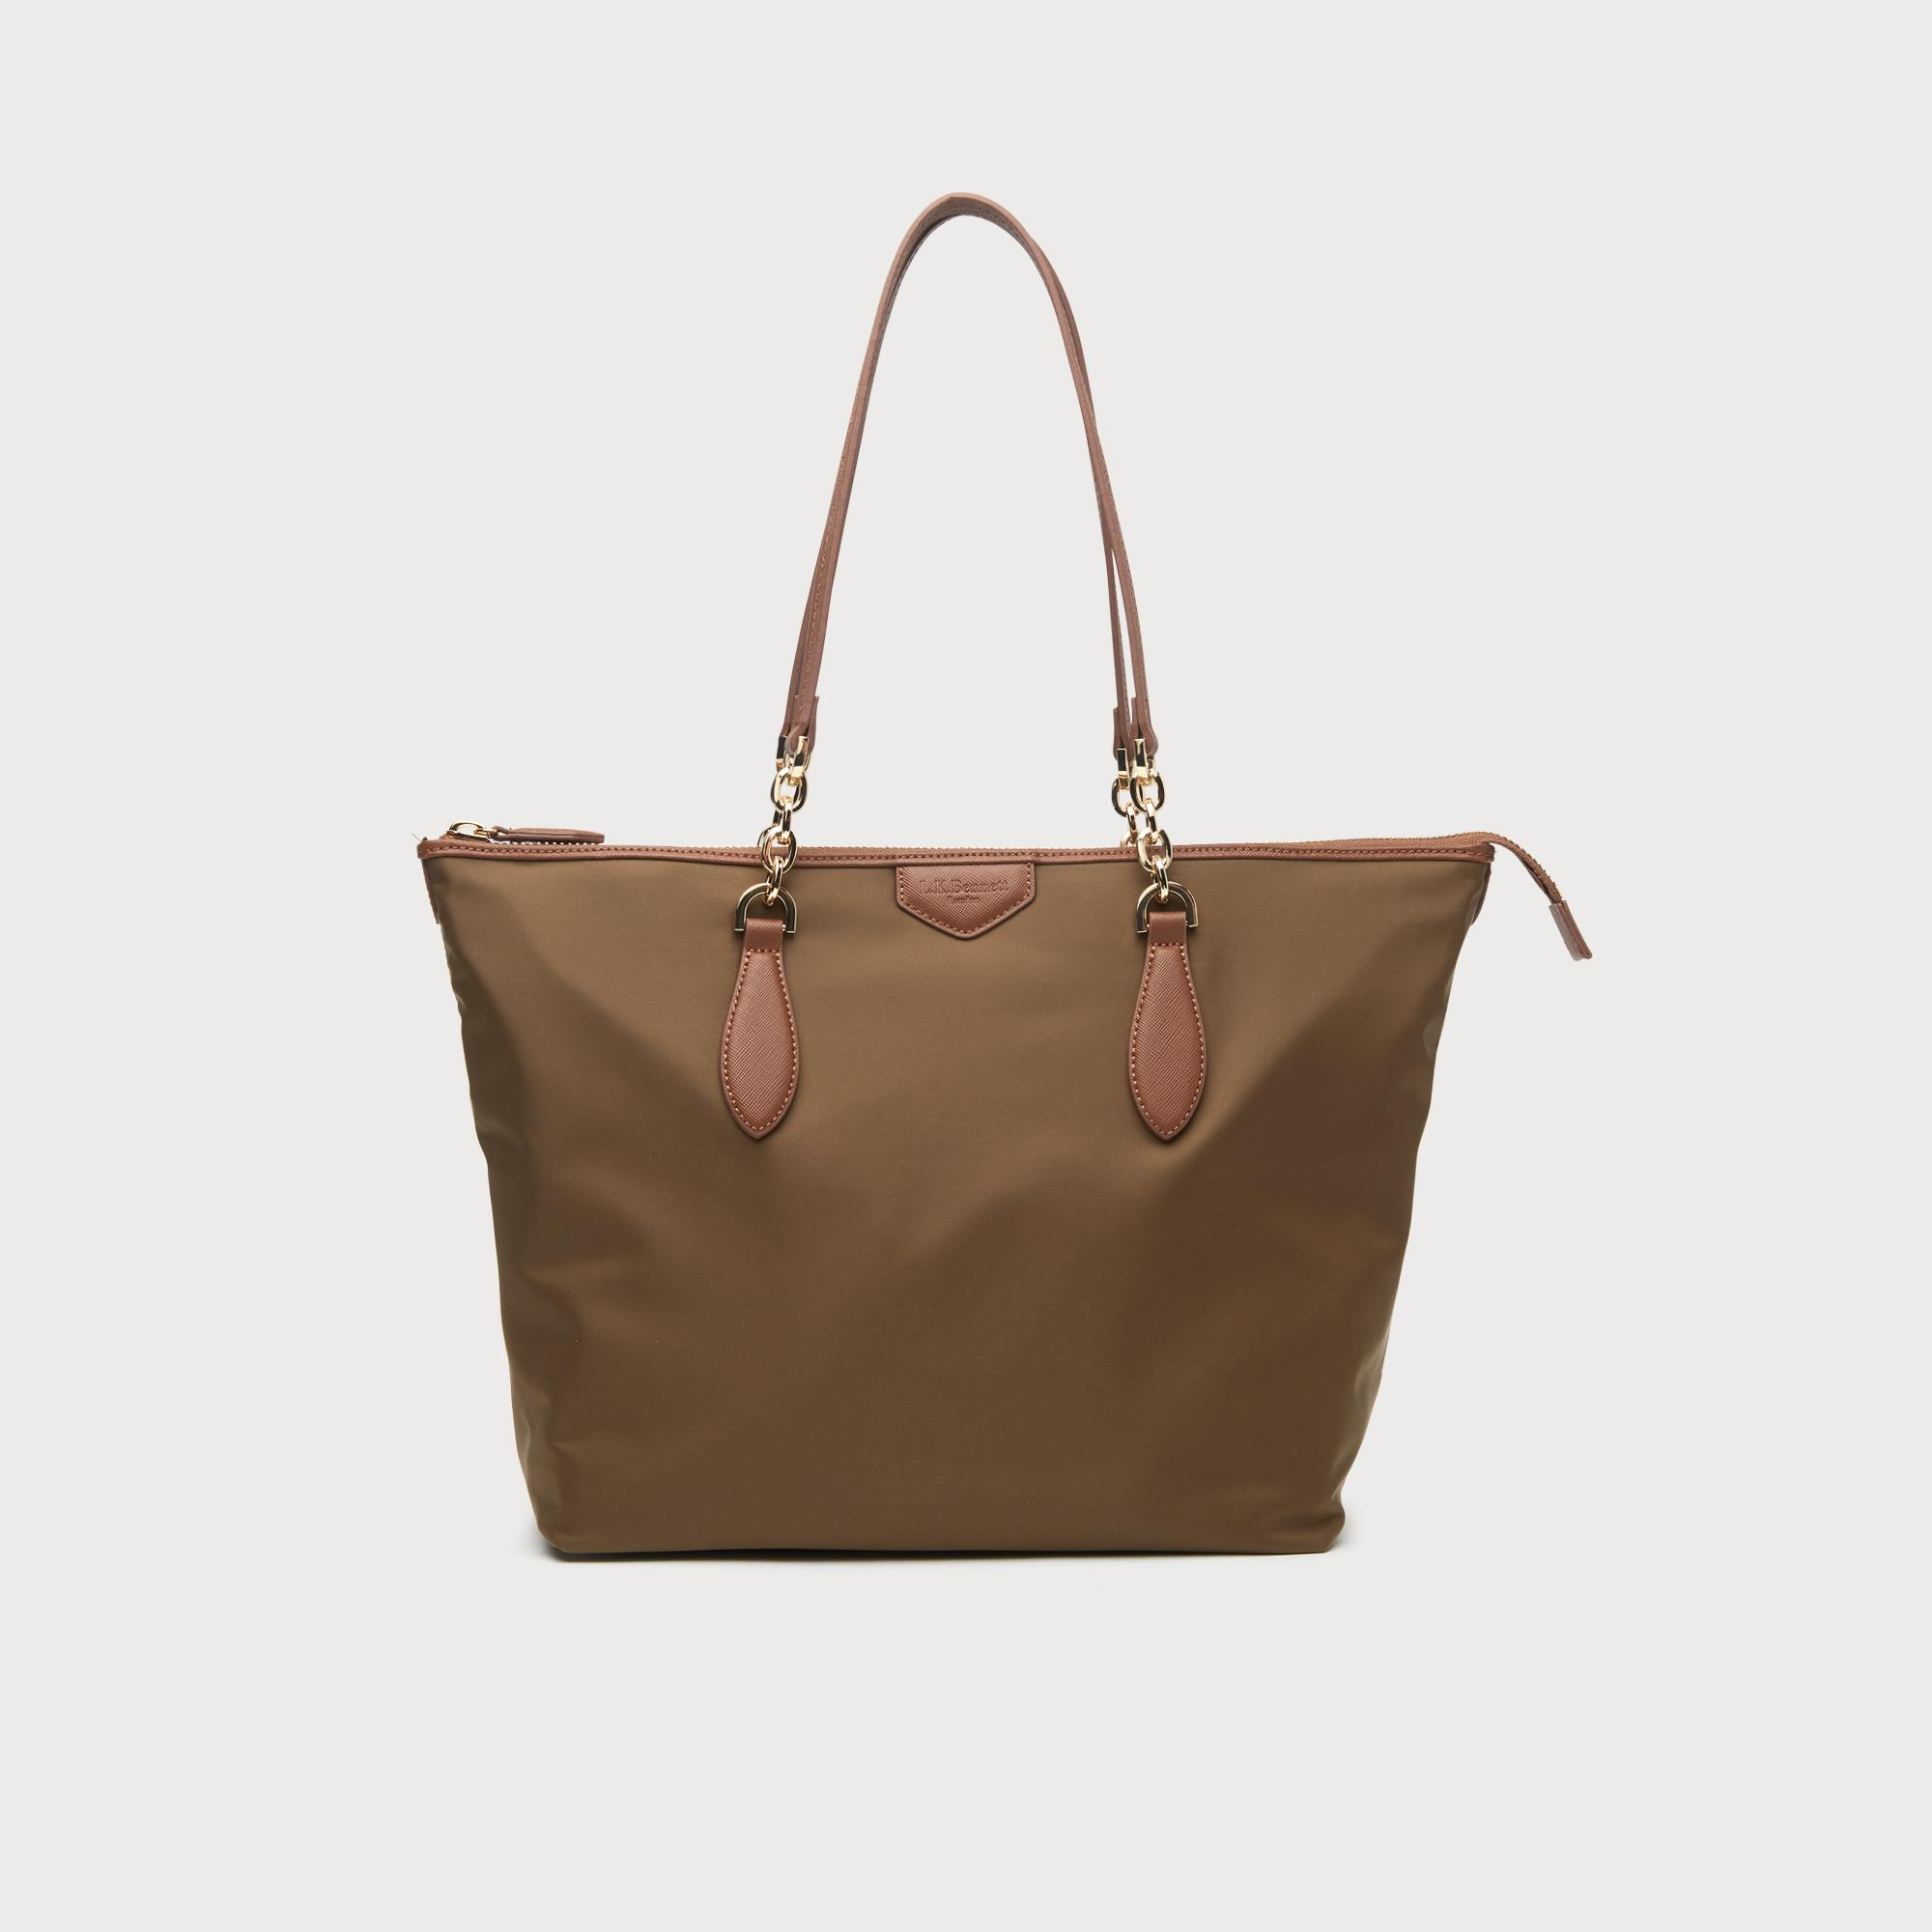 Brooke Khaki Tote Bag